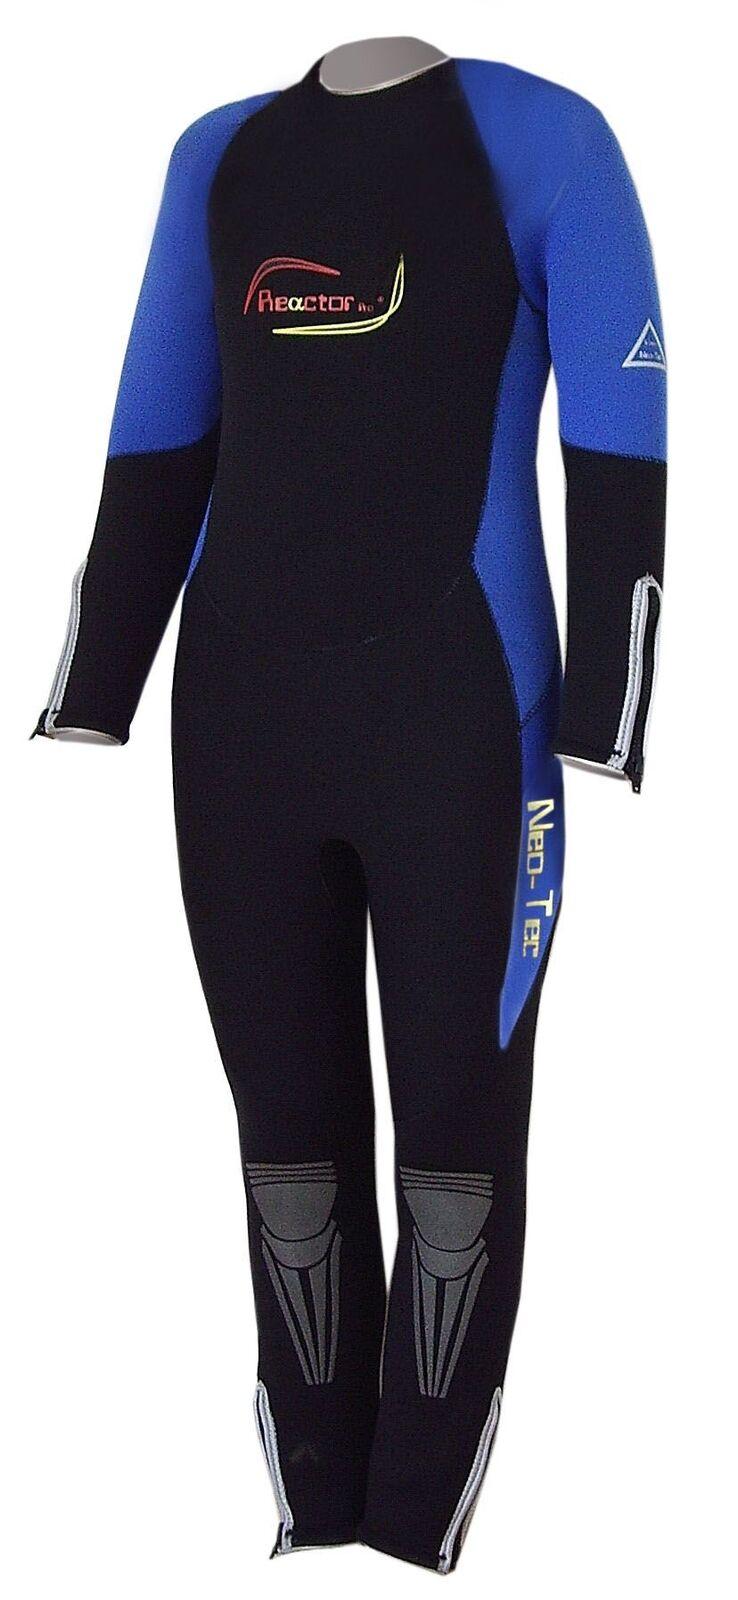 5mm Kinder Neopren Neopren Neopren Anzug Nassanzug Surfanzug Tauchanzug Reactor NEU e841d6